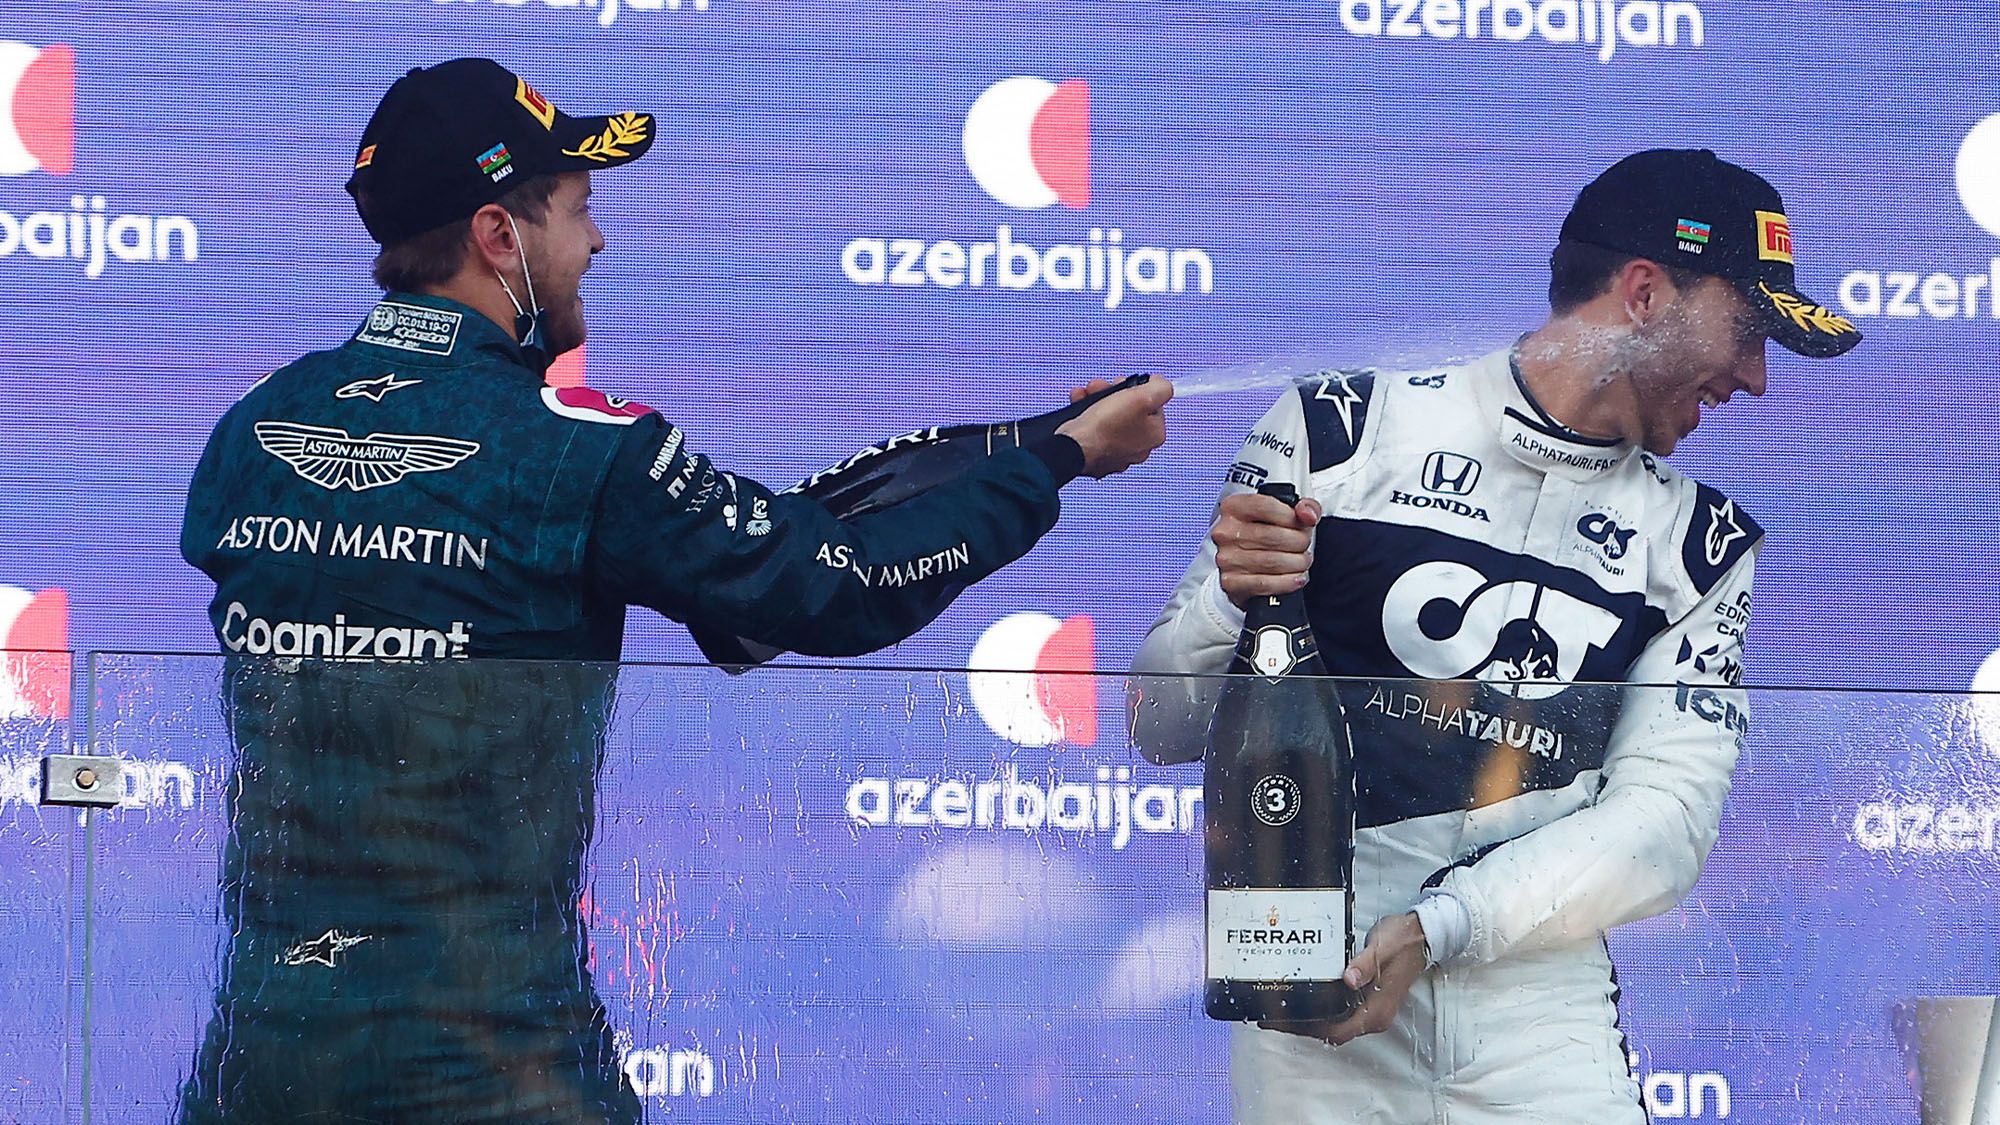 Sebastian Vettel and Pierre Gasly spray champagne after the 2021 Azerbaijan Grand Prix